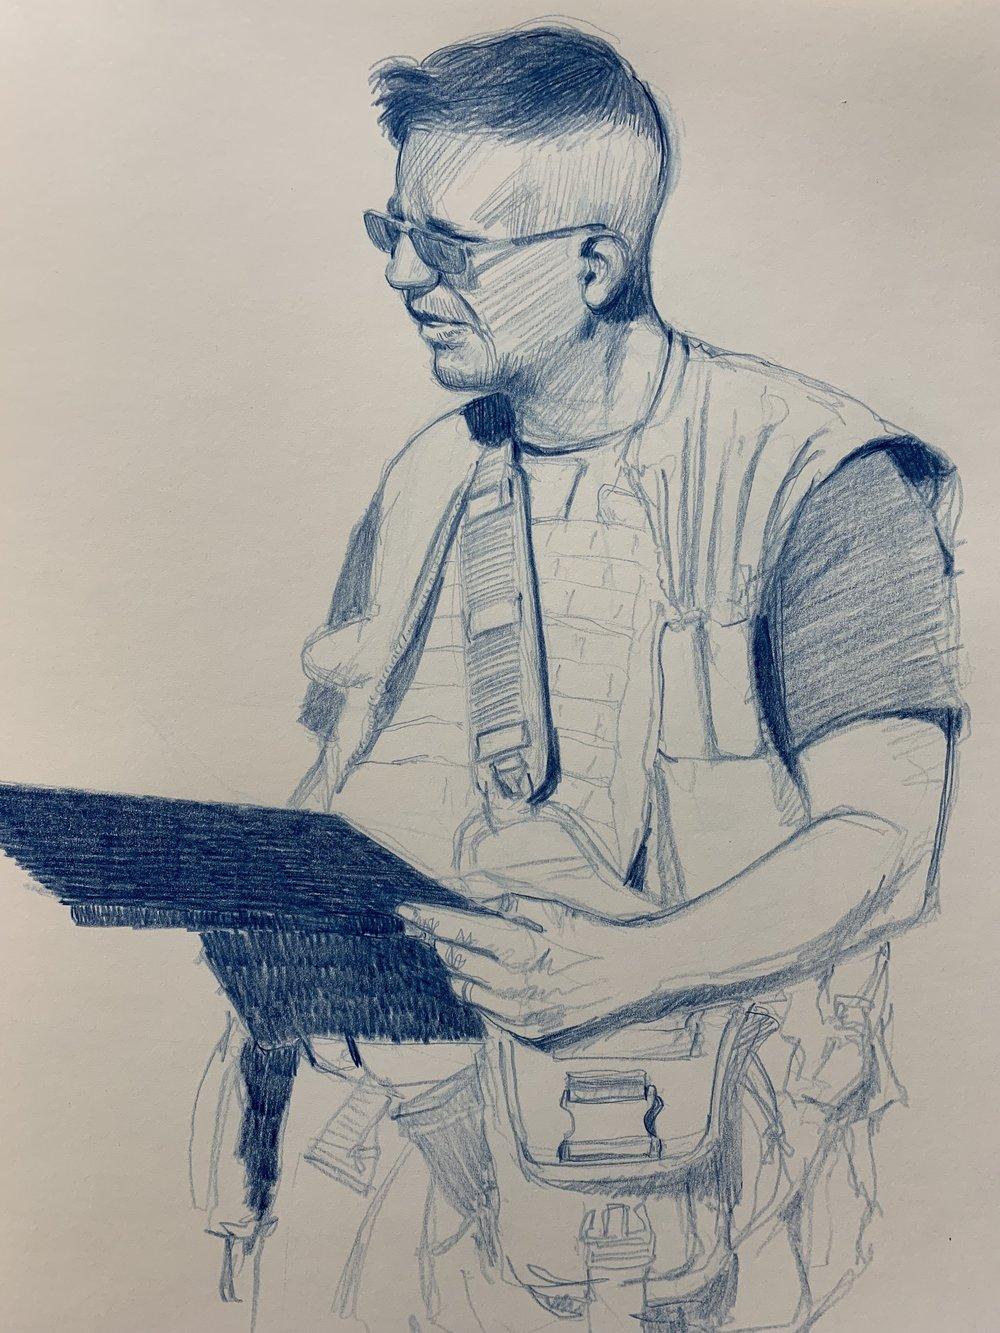 Victor Juhasz, Combat Artist at ITX 2018, 29 Palms, CA